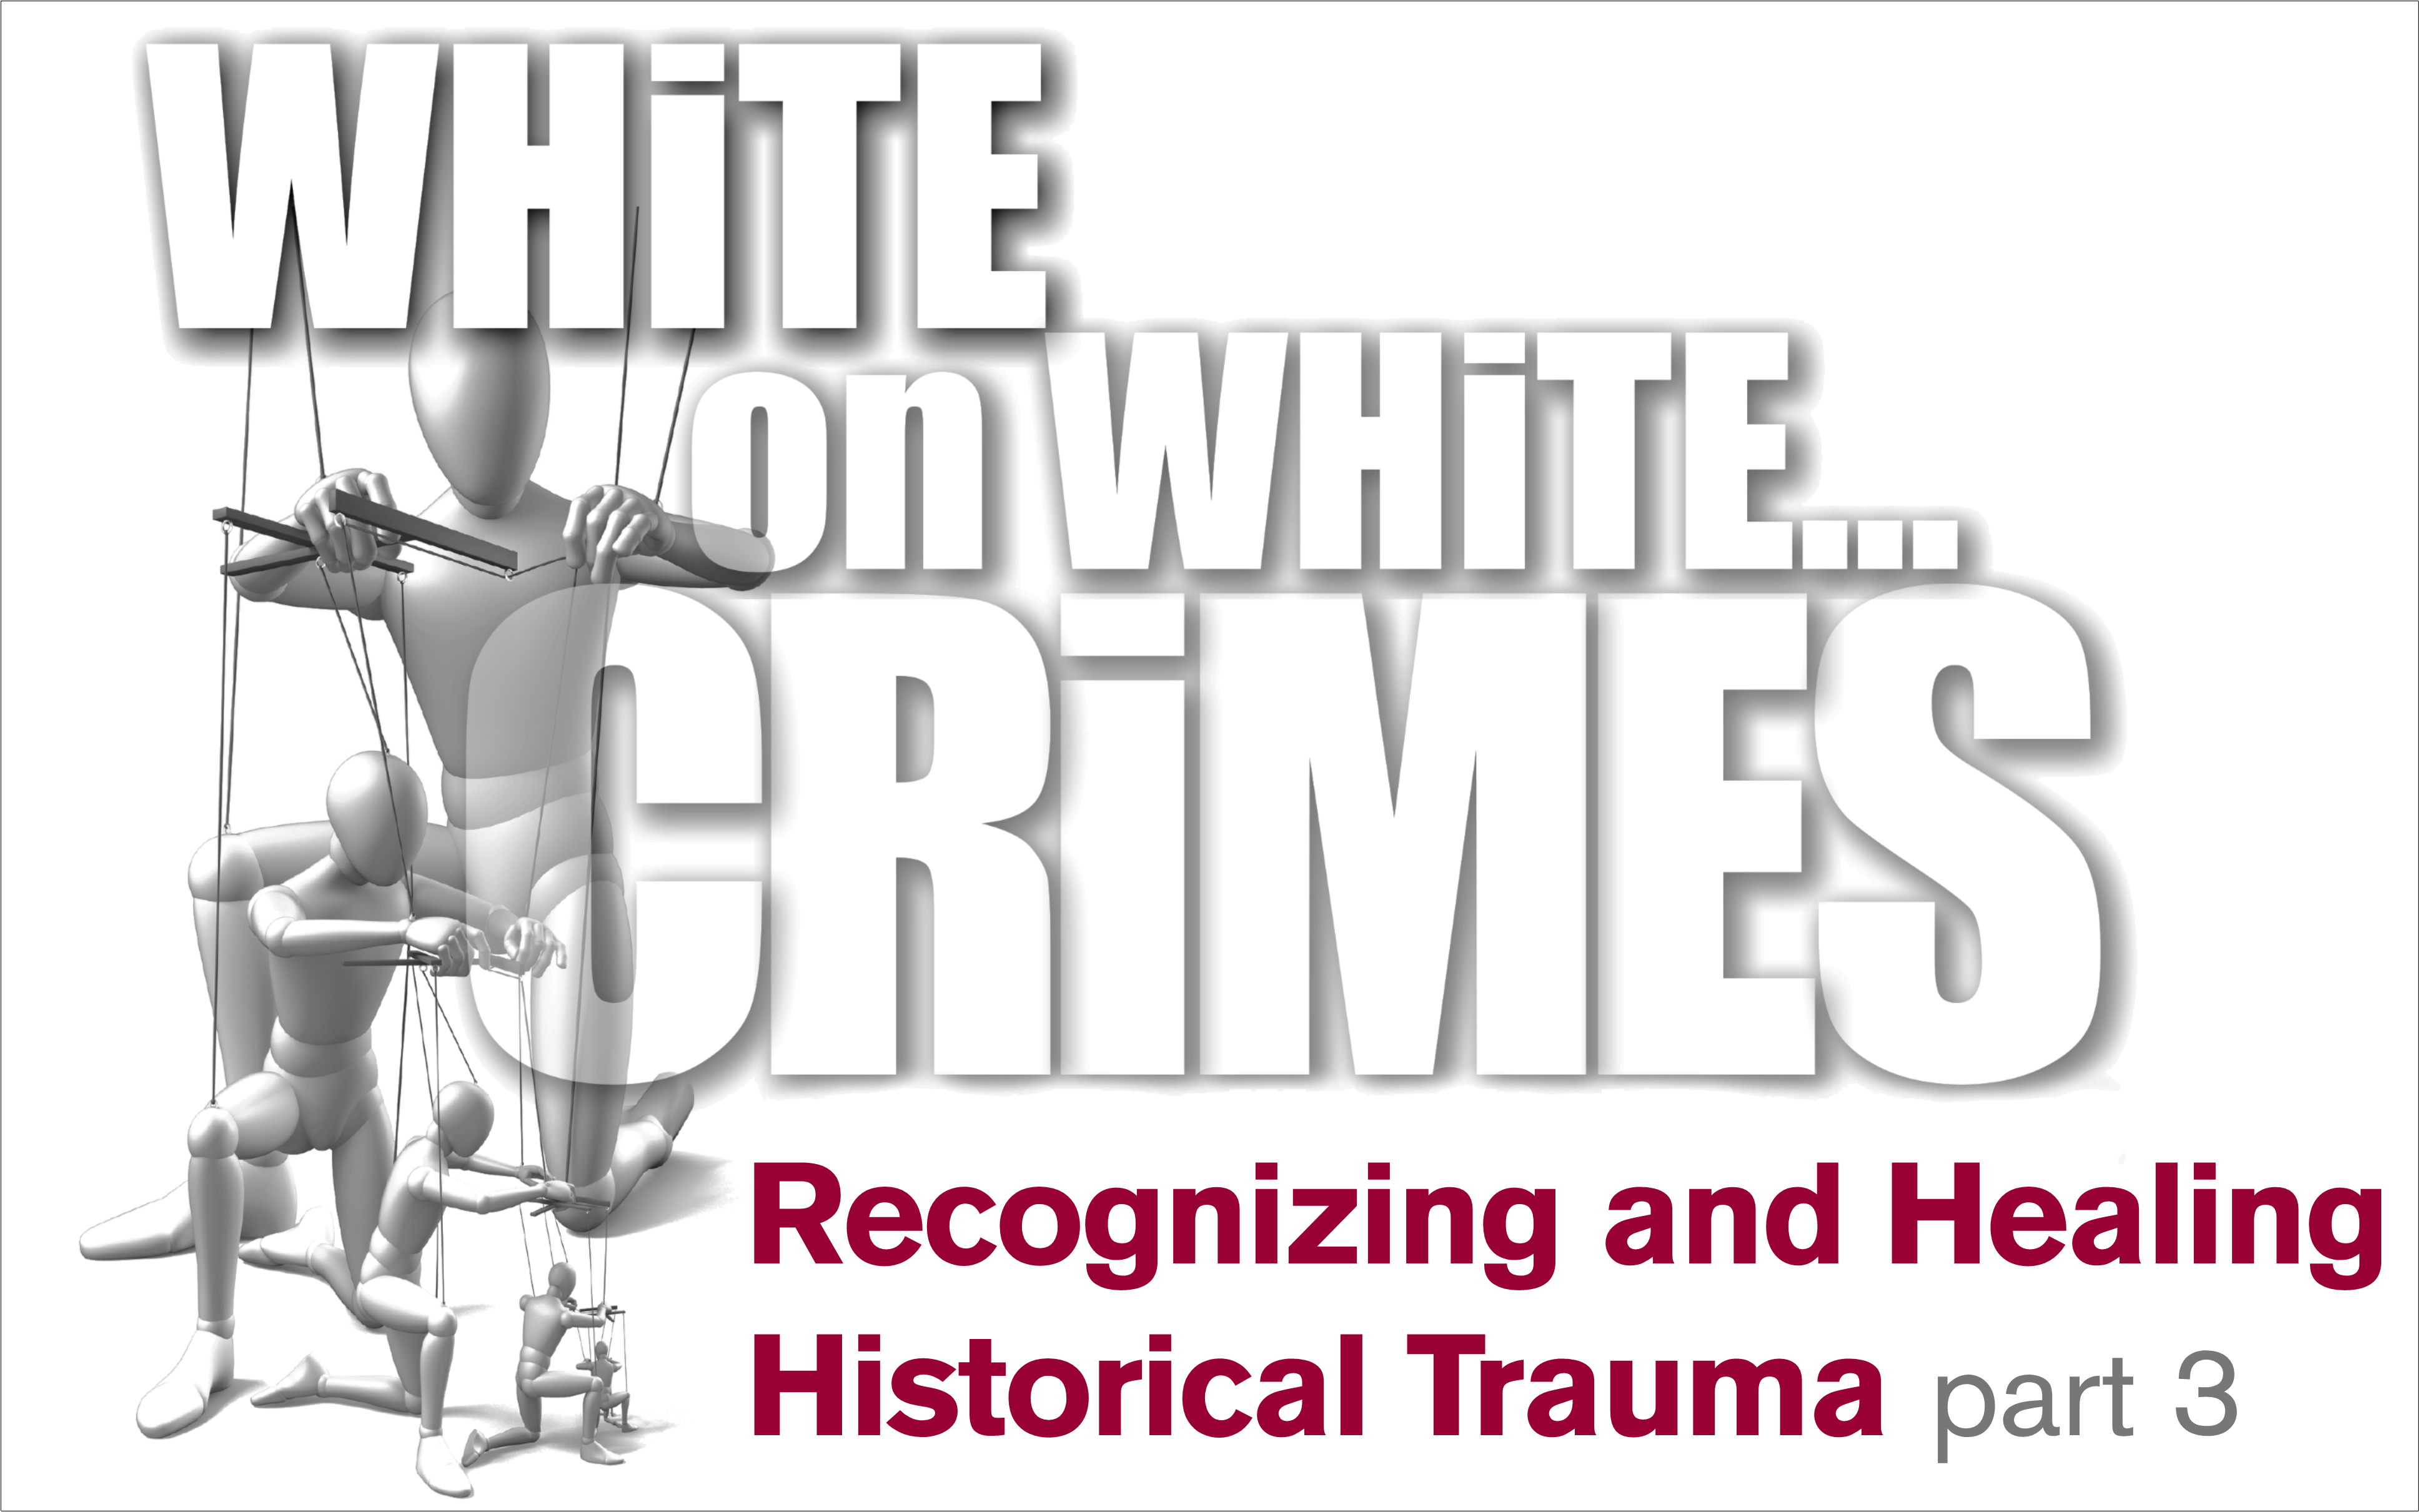 Historical Trauma Image